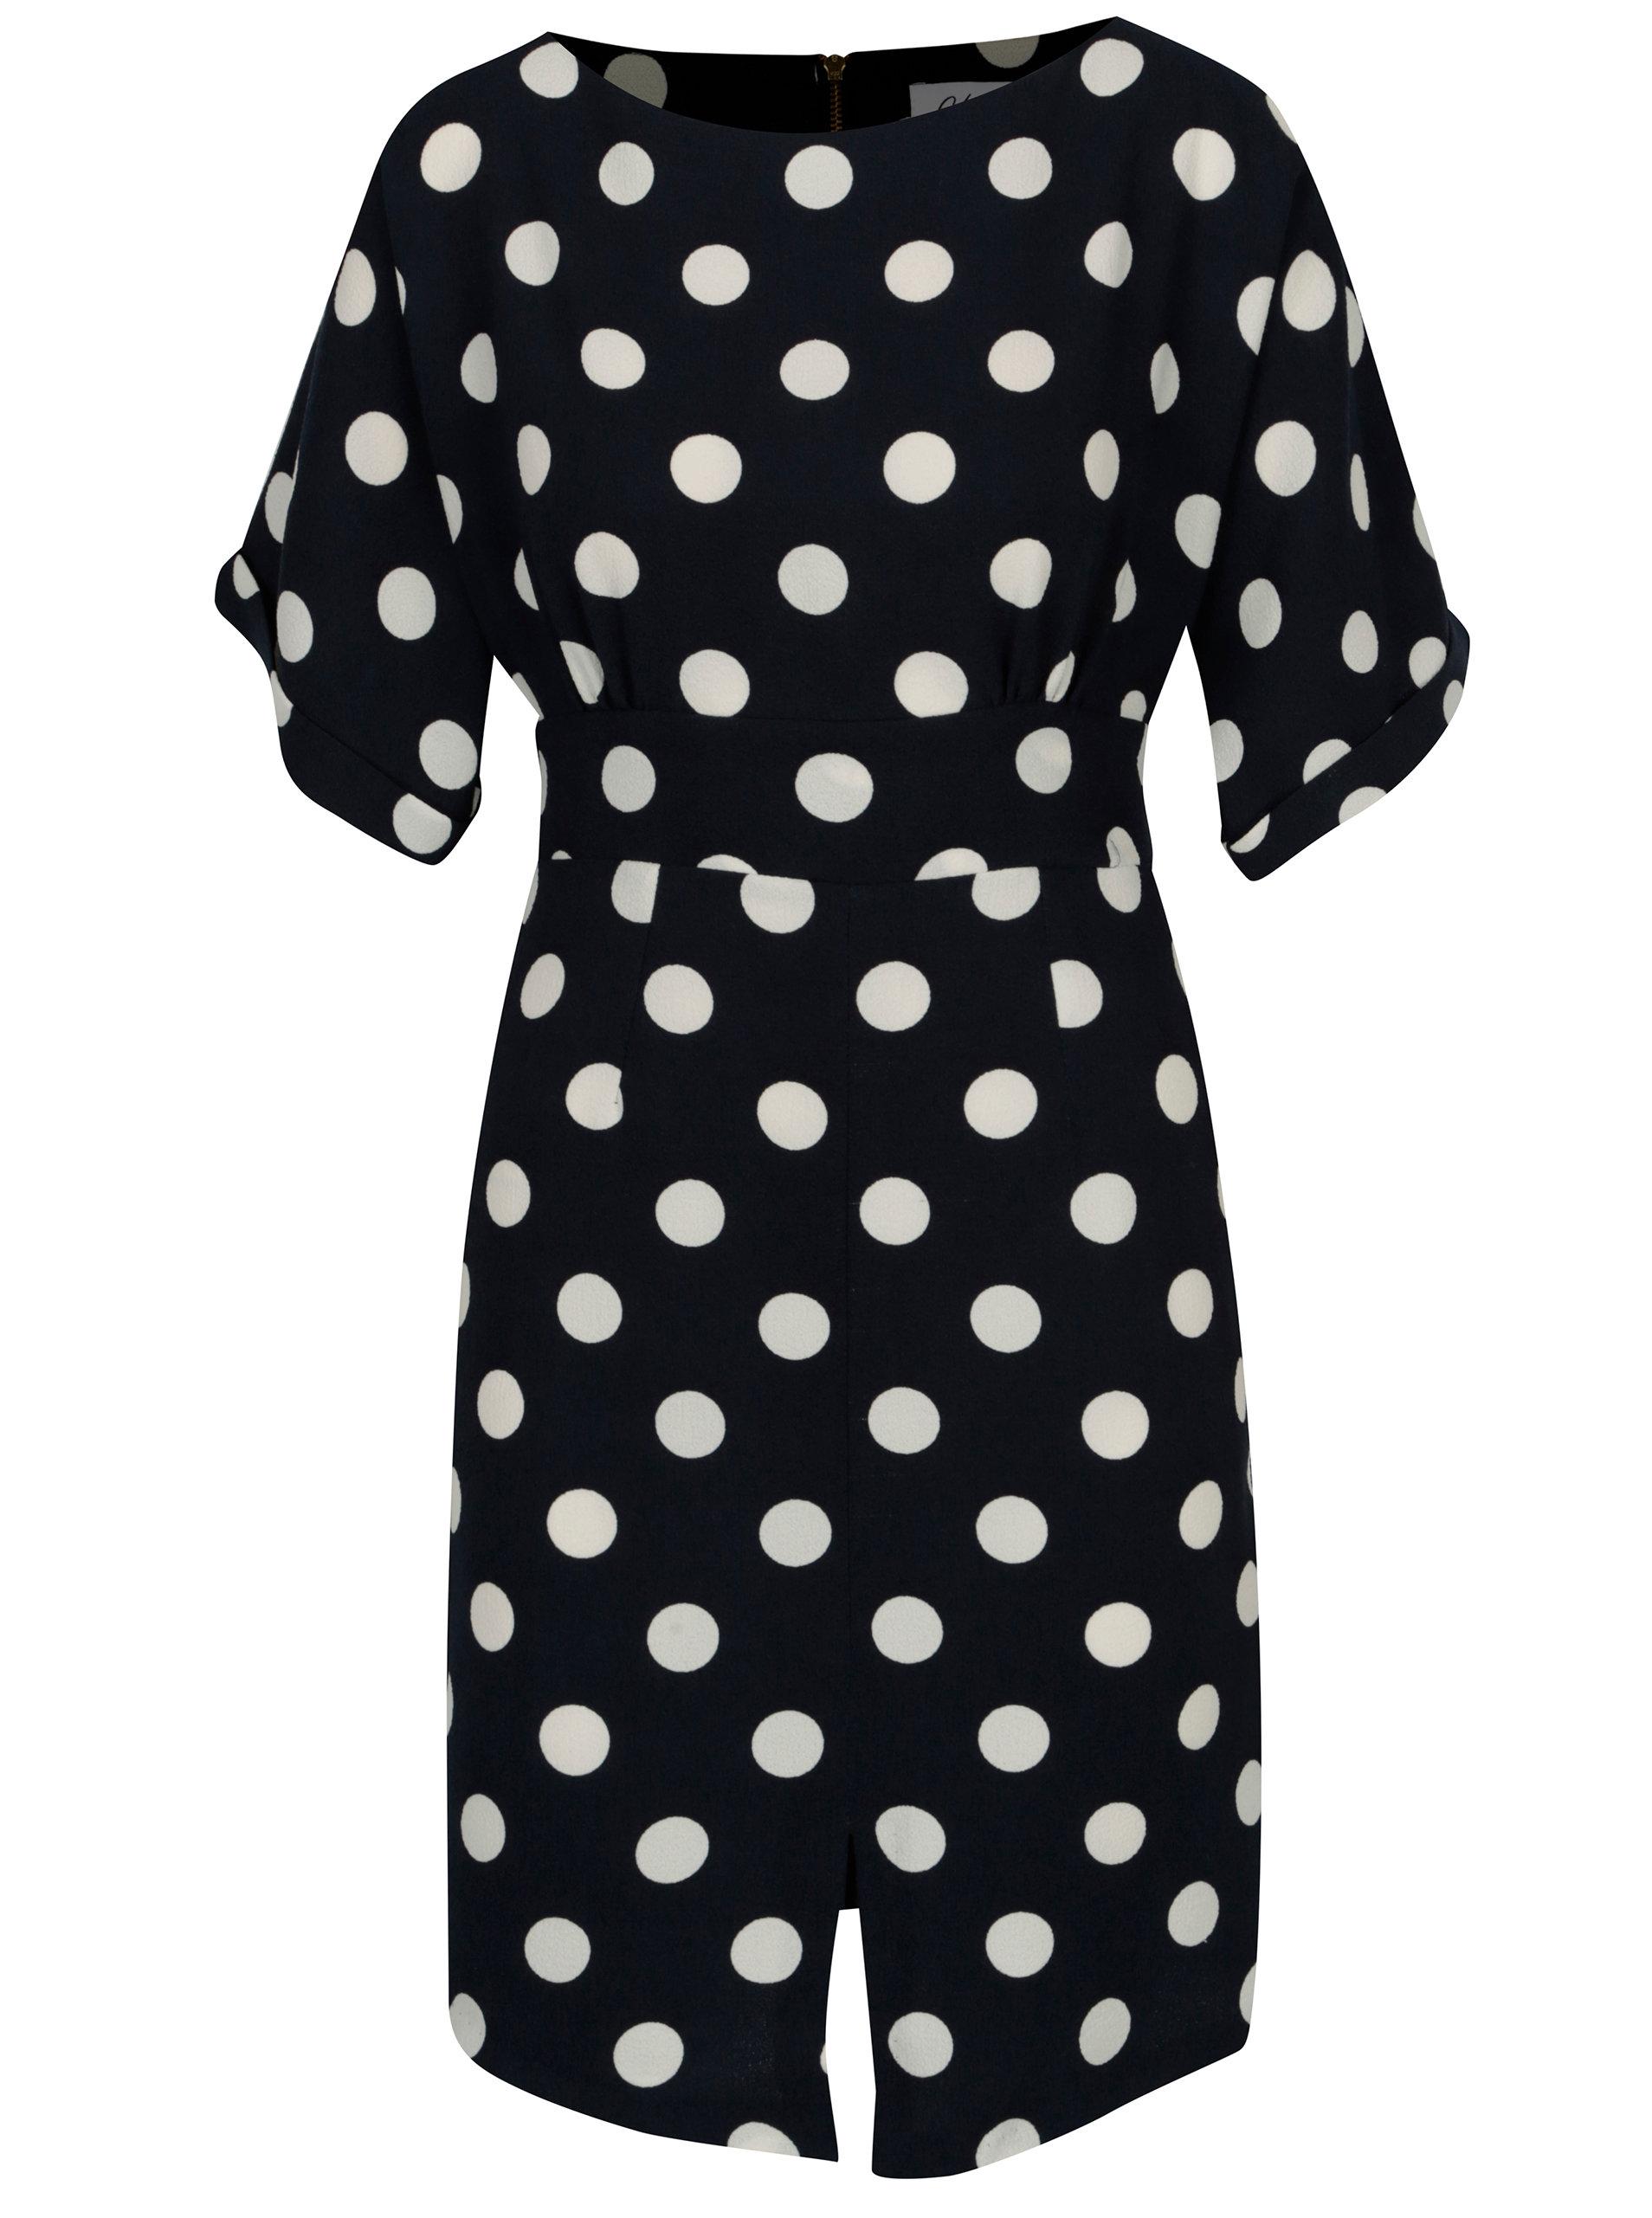 926b43d2cb59 Tmavomodré bodkované šaty s opaskom Closet ...